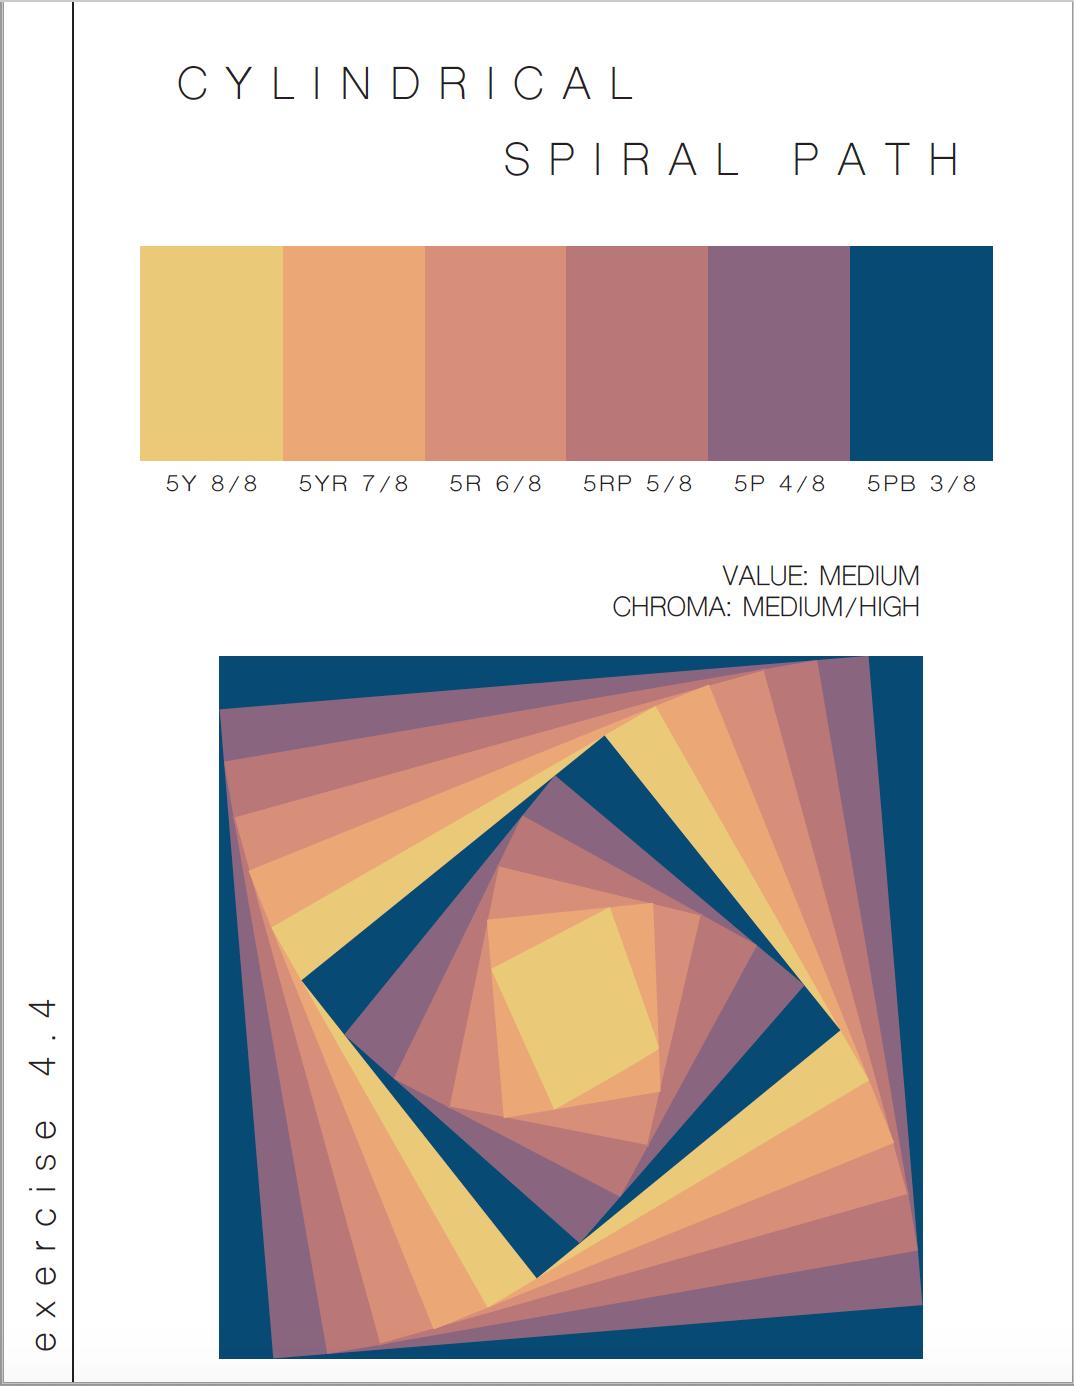 Cylindrical Spiral Path